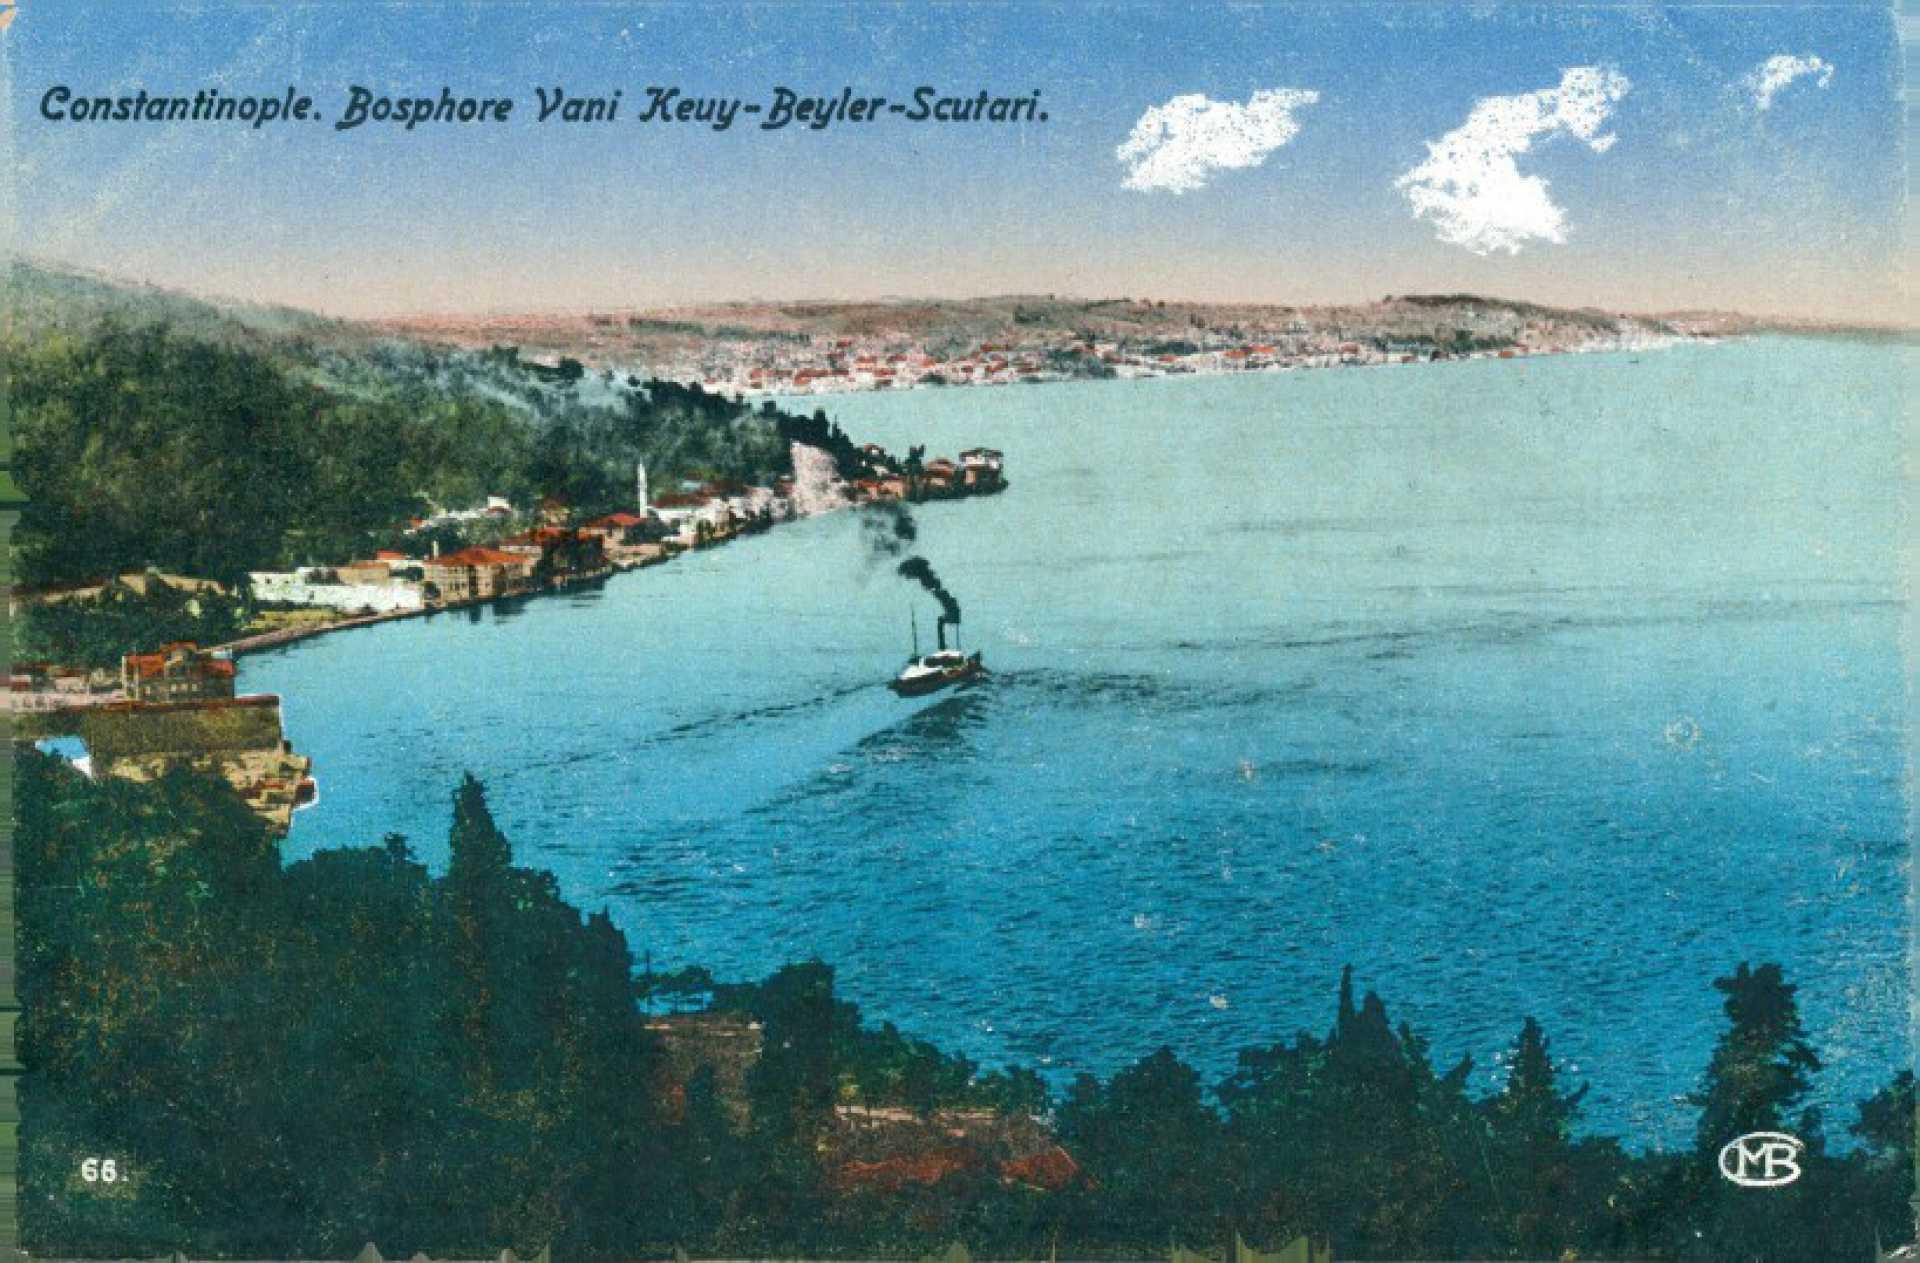 Bosphore Vani Keuy-Beyler-Scutari.